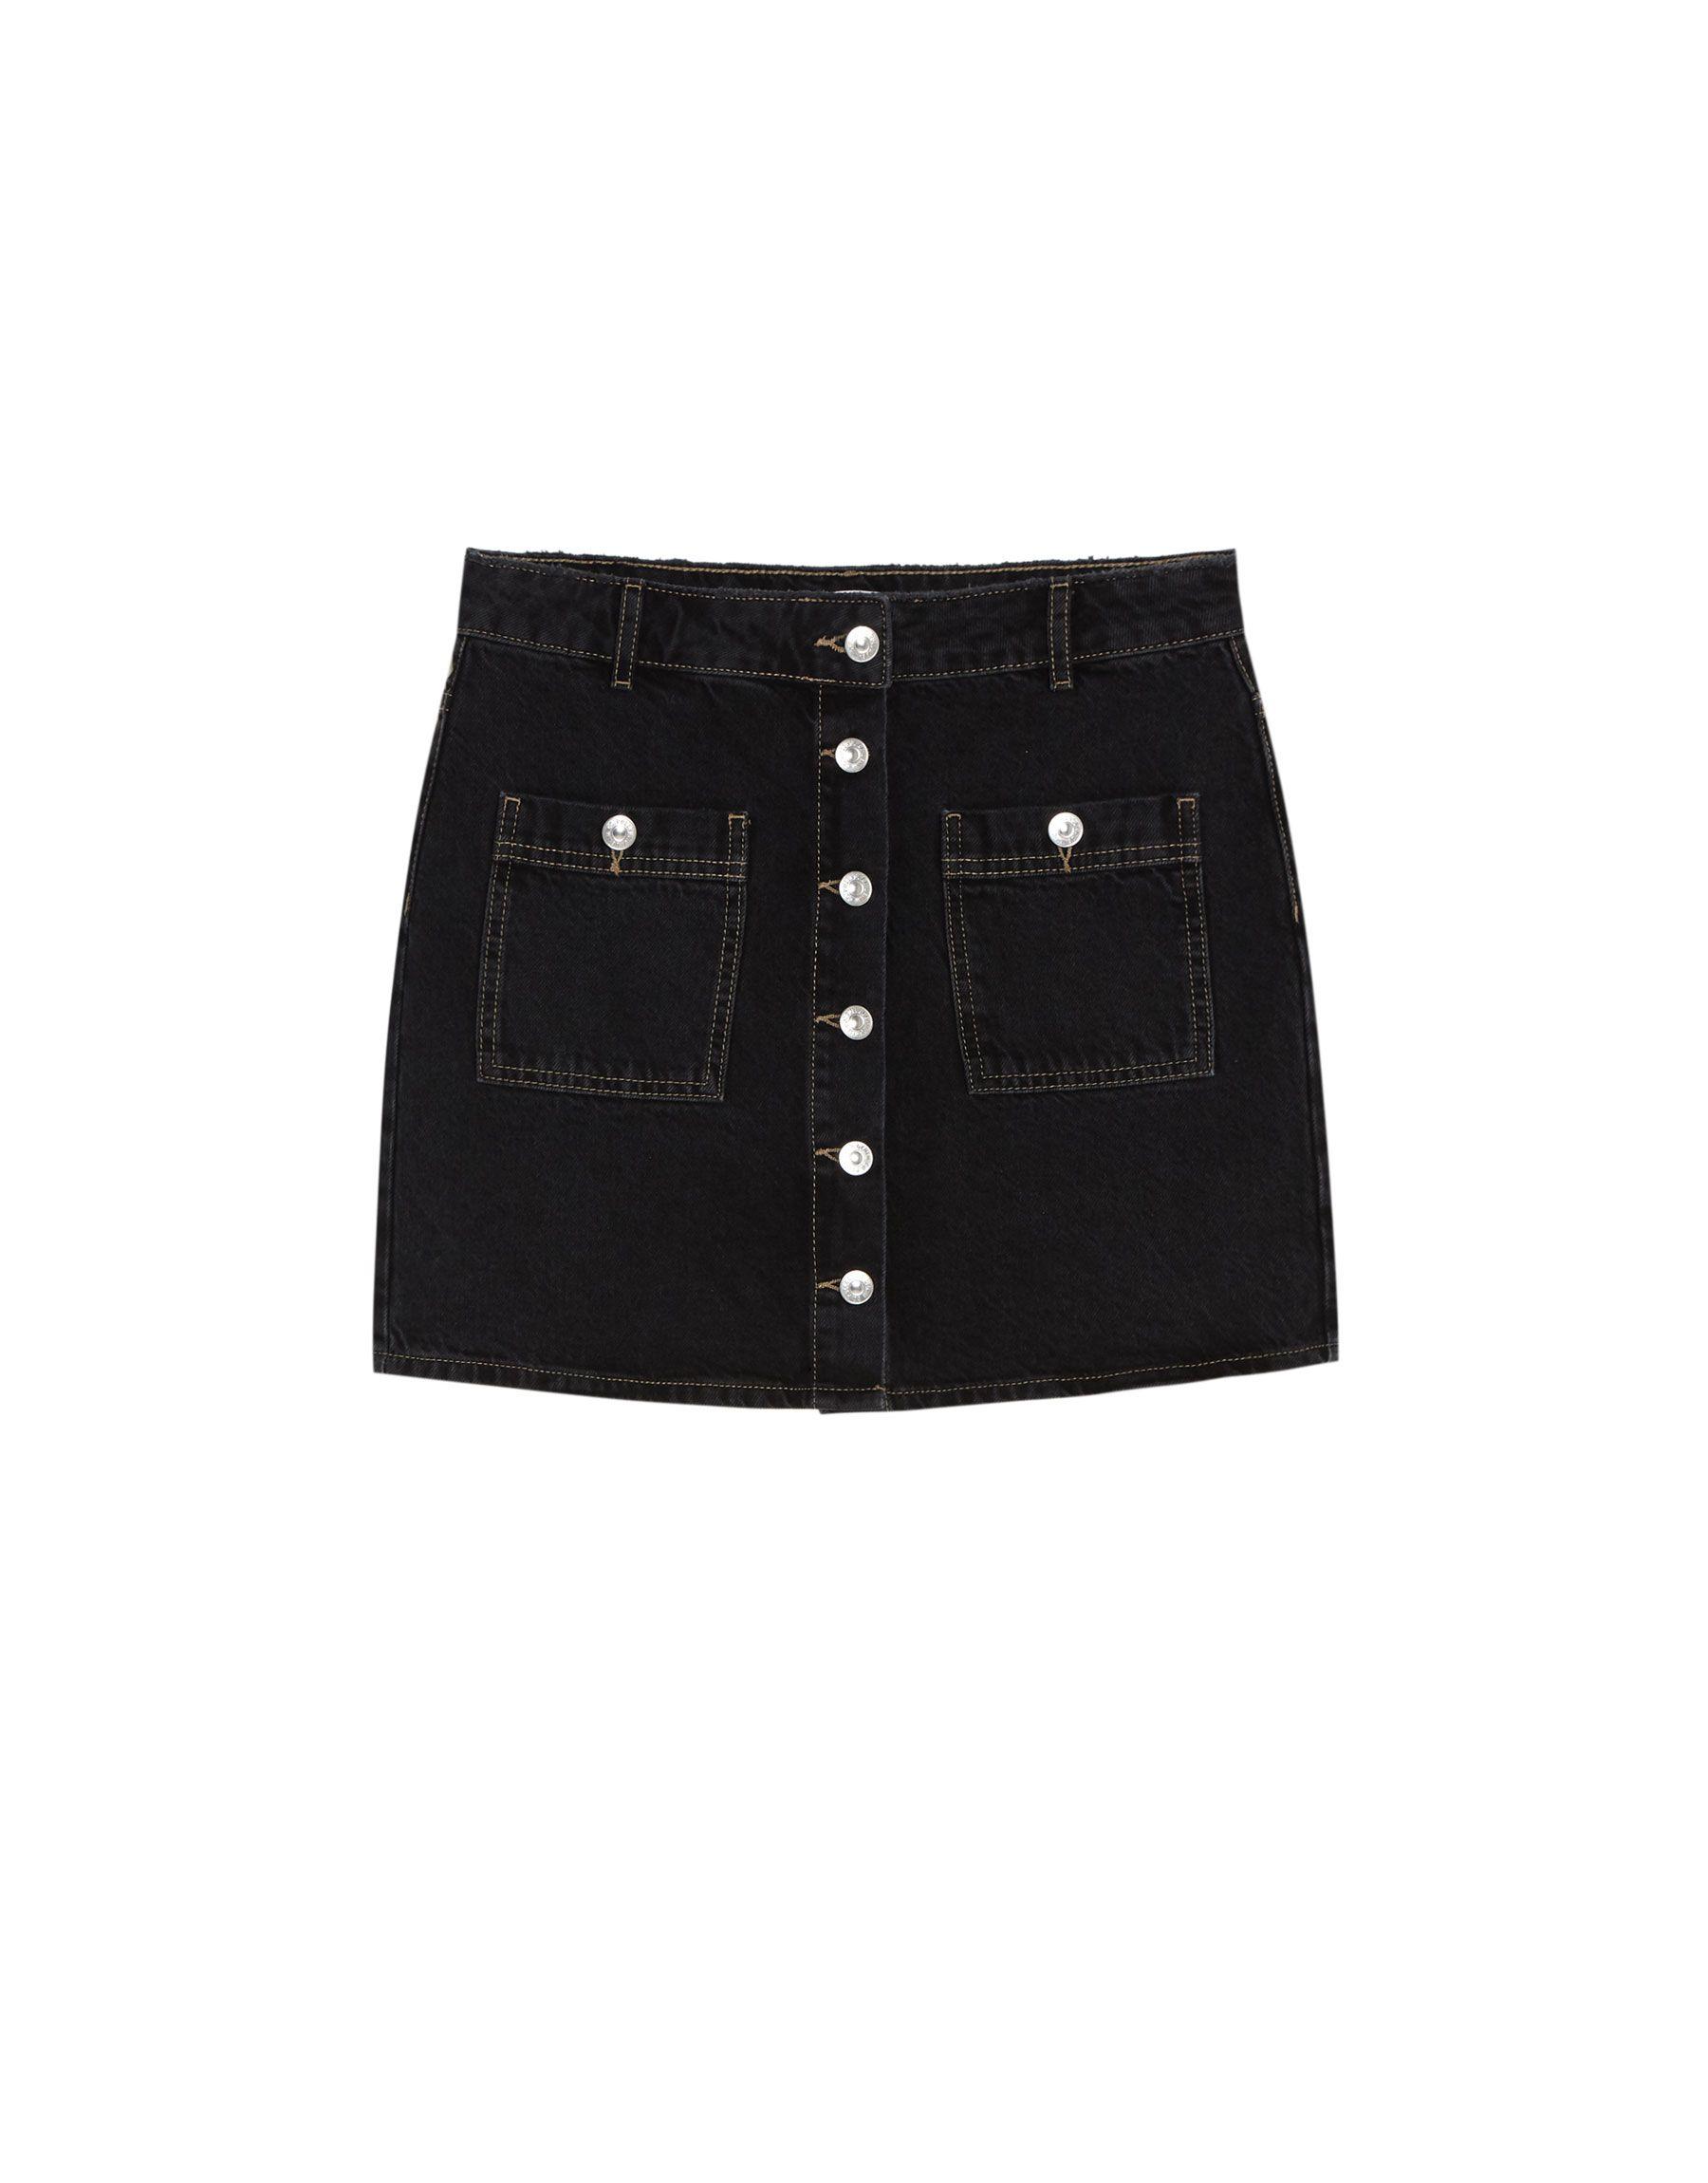 Minifalda vaquera - Faldas - Ropa - Mujer - PULL BEAR España  3a4e73d14688